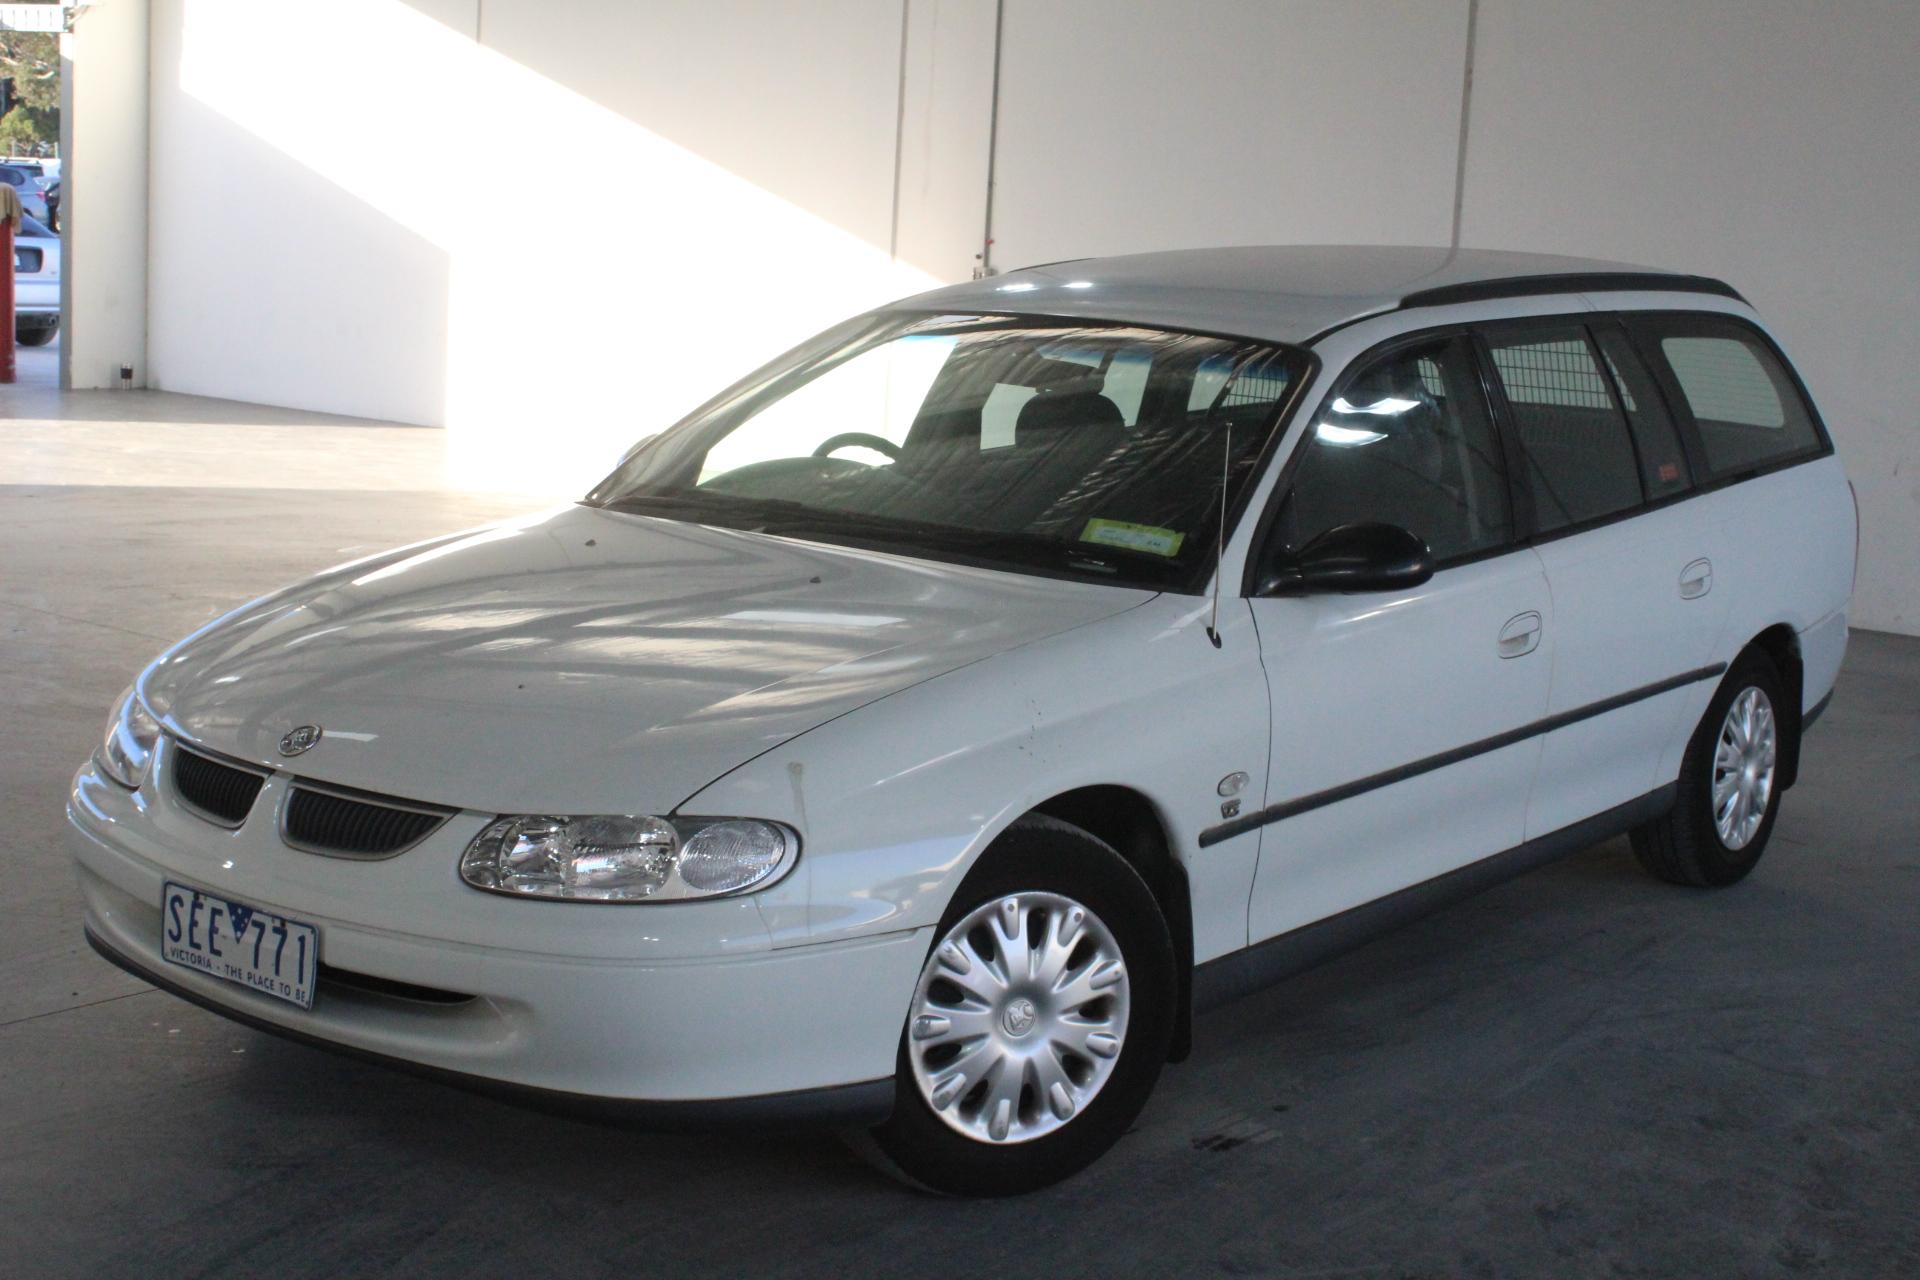 1999 Holden Commodore Executive VT Automatic Wagon